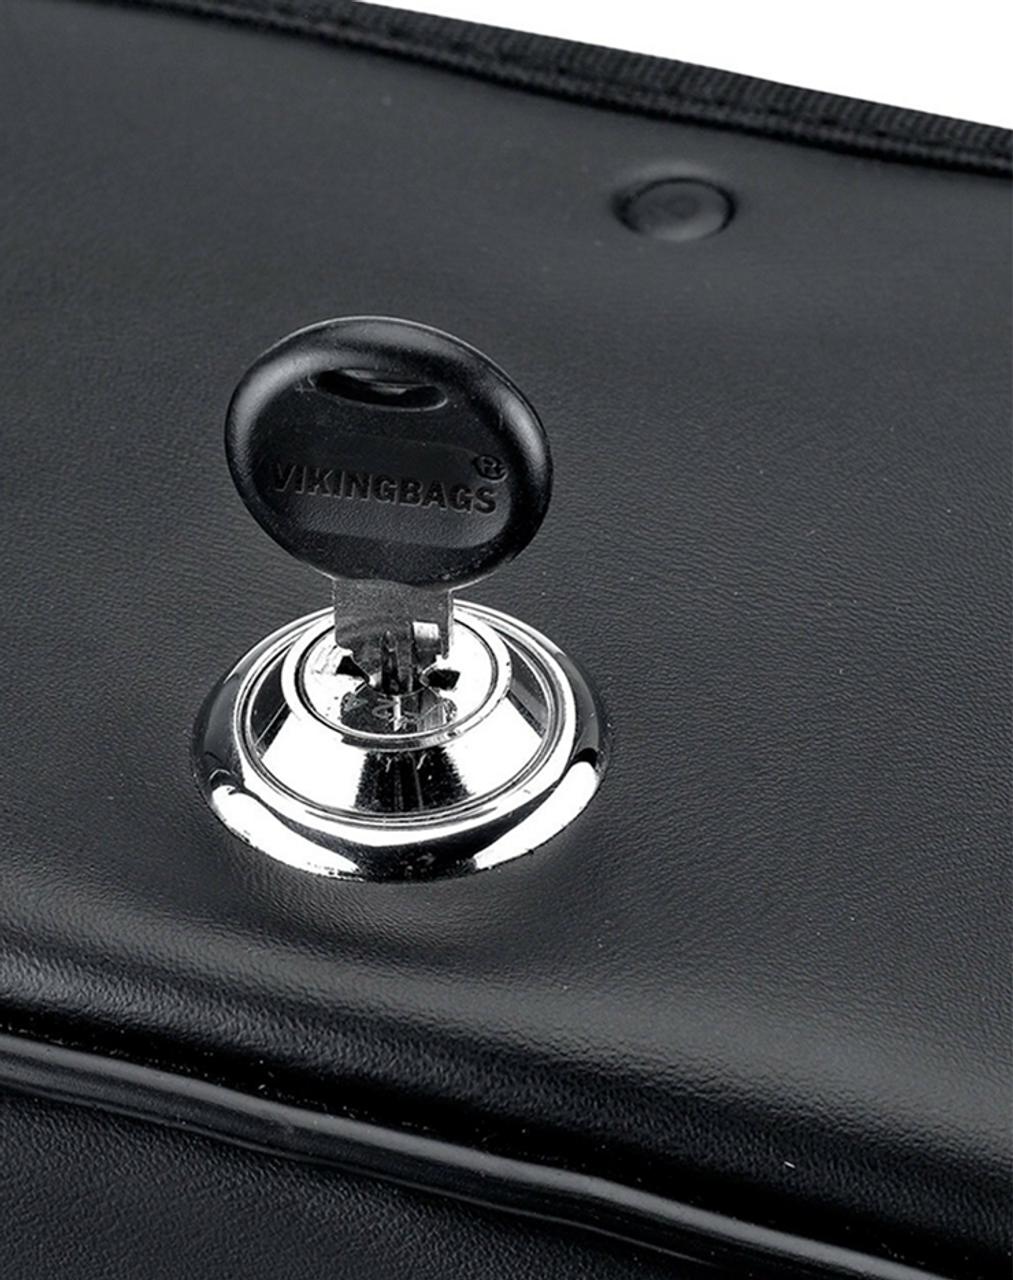 Honda Magna 750 Medium Charger Slanted Motorcycle Saddlebags lock key view